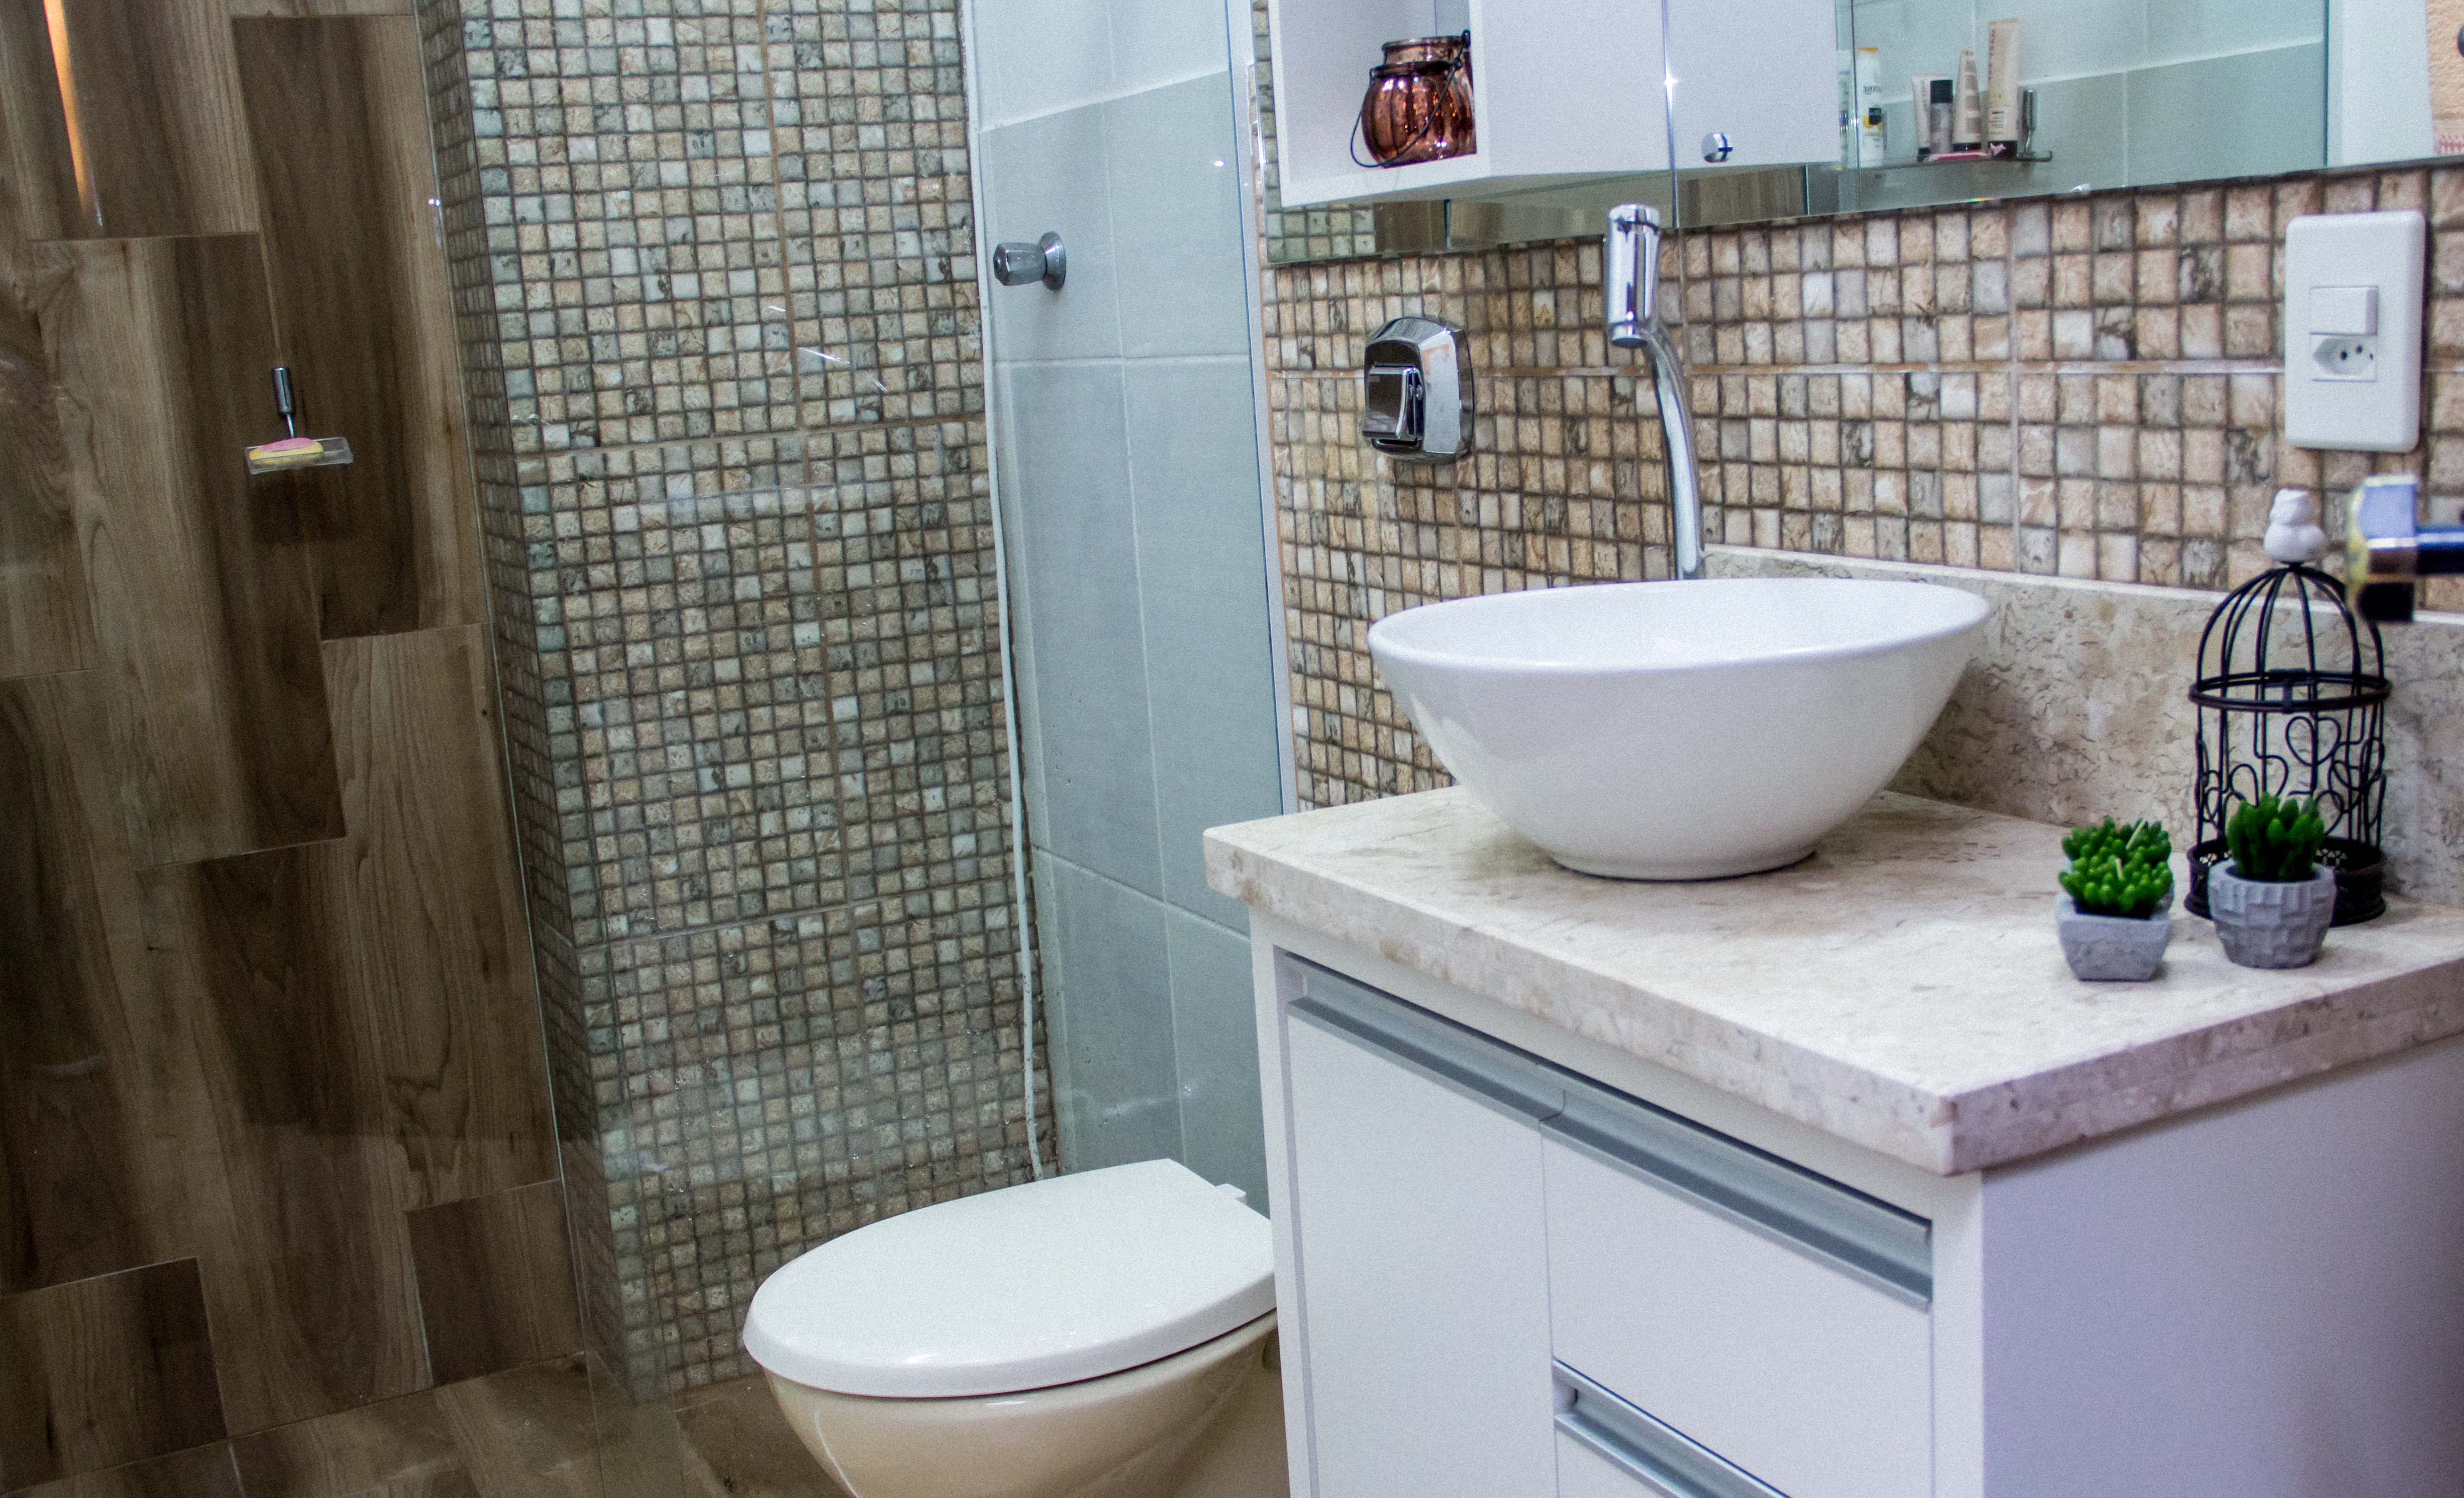 Banheiros Sob Medida Banheiros Planejados em Blumenau #3B3325 4923 2992